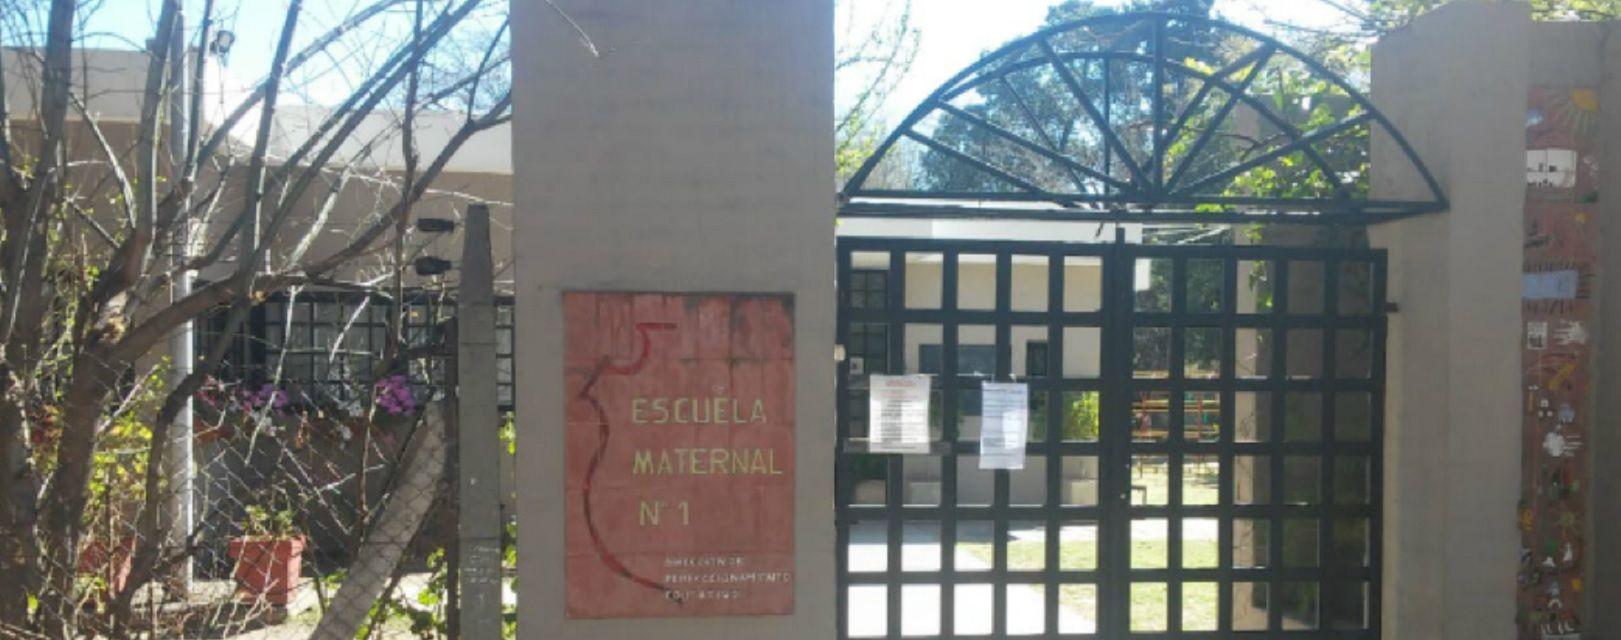 Córdoba: maestras denuncian que prostitutas usan un jardín de infantes como albergue transitorio